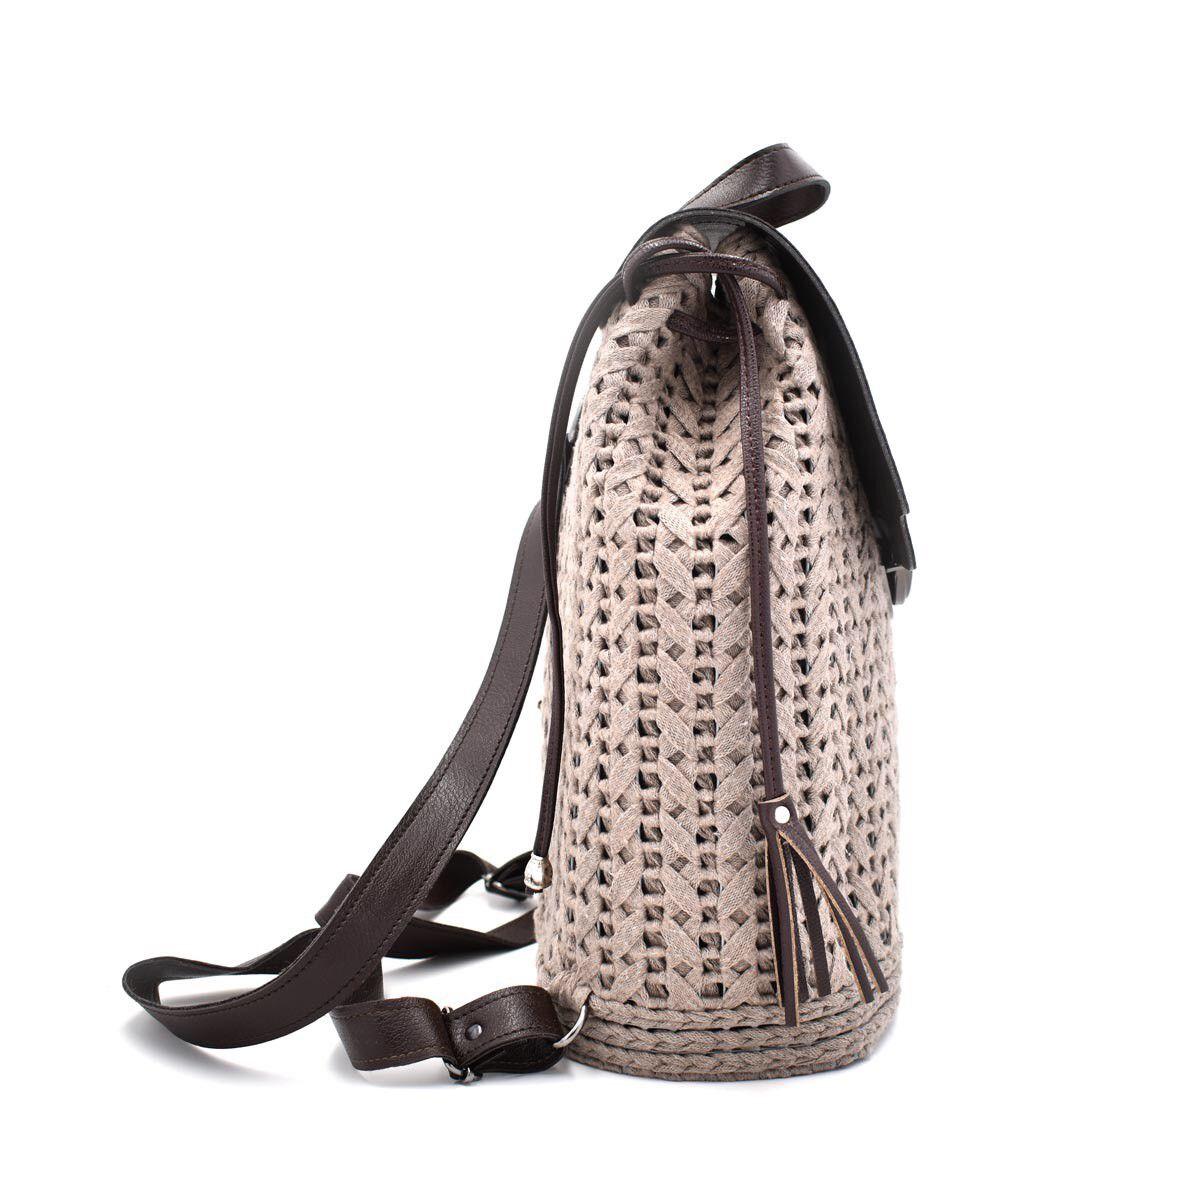 c167adfdc5 Αρχική σελίδαΝέες ΑφίξειςΧειροποίητη πλεκτή τσάντα πλάτης Μπέζ-καφέ. -36%  Νέο. 🔍. 1  2